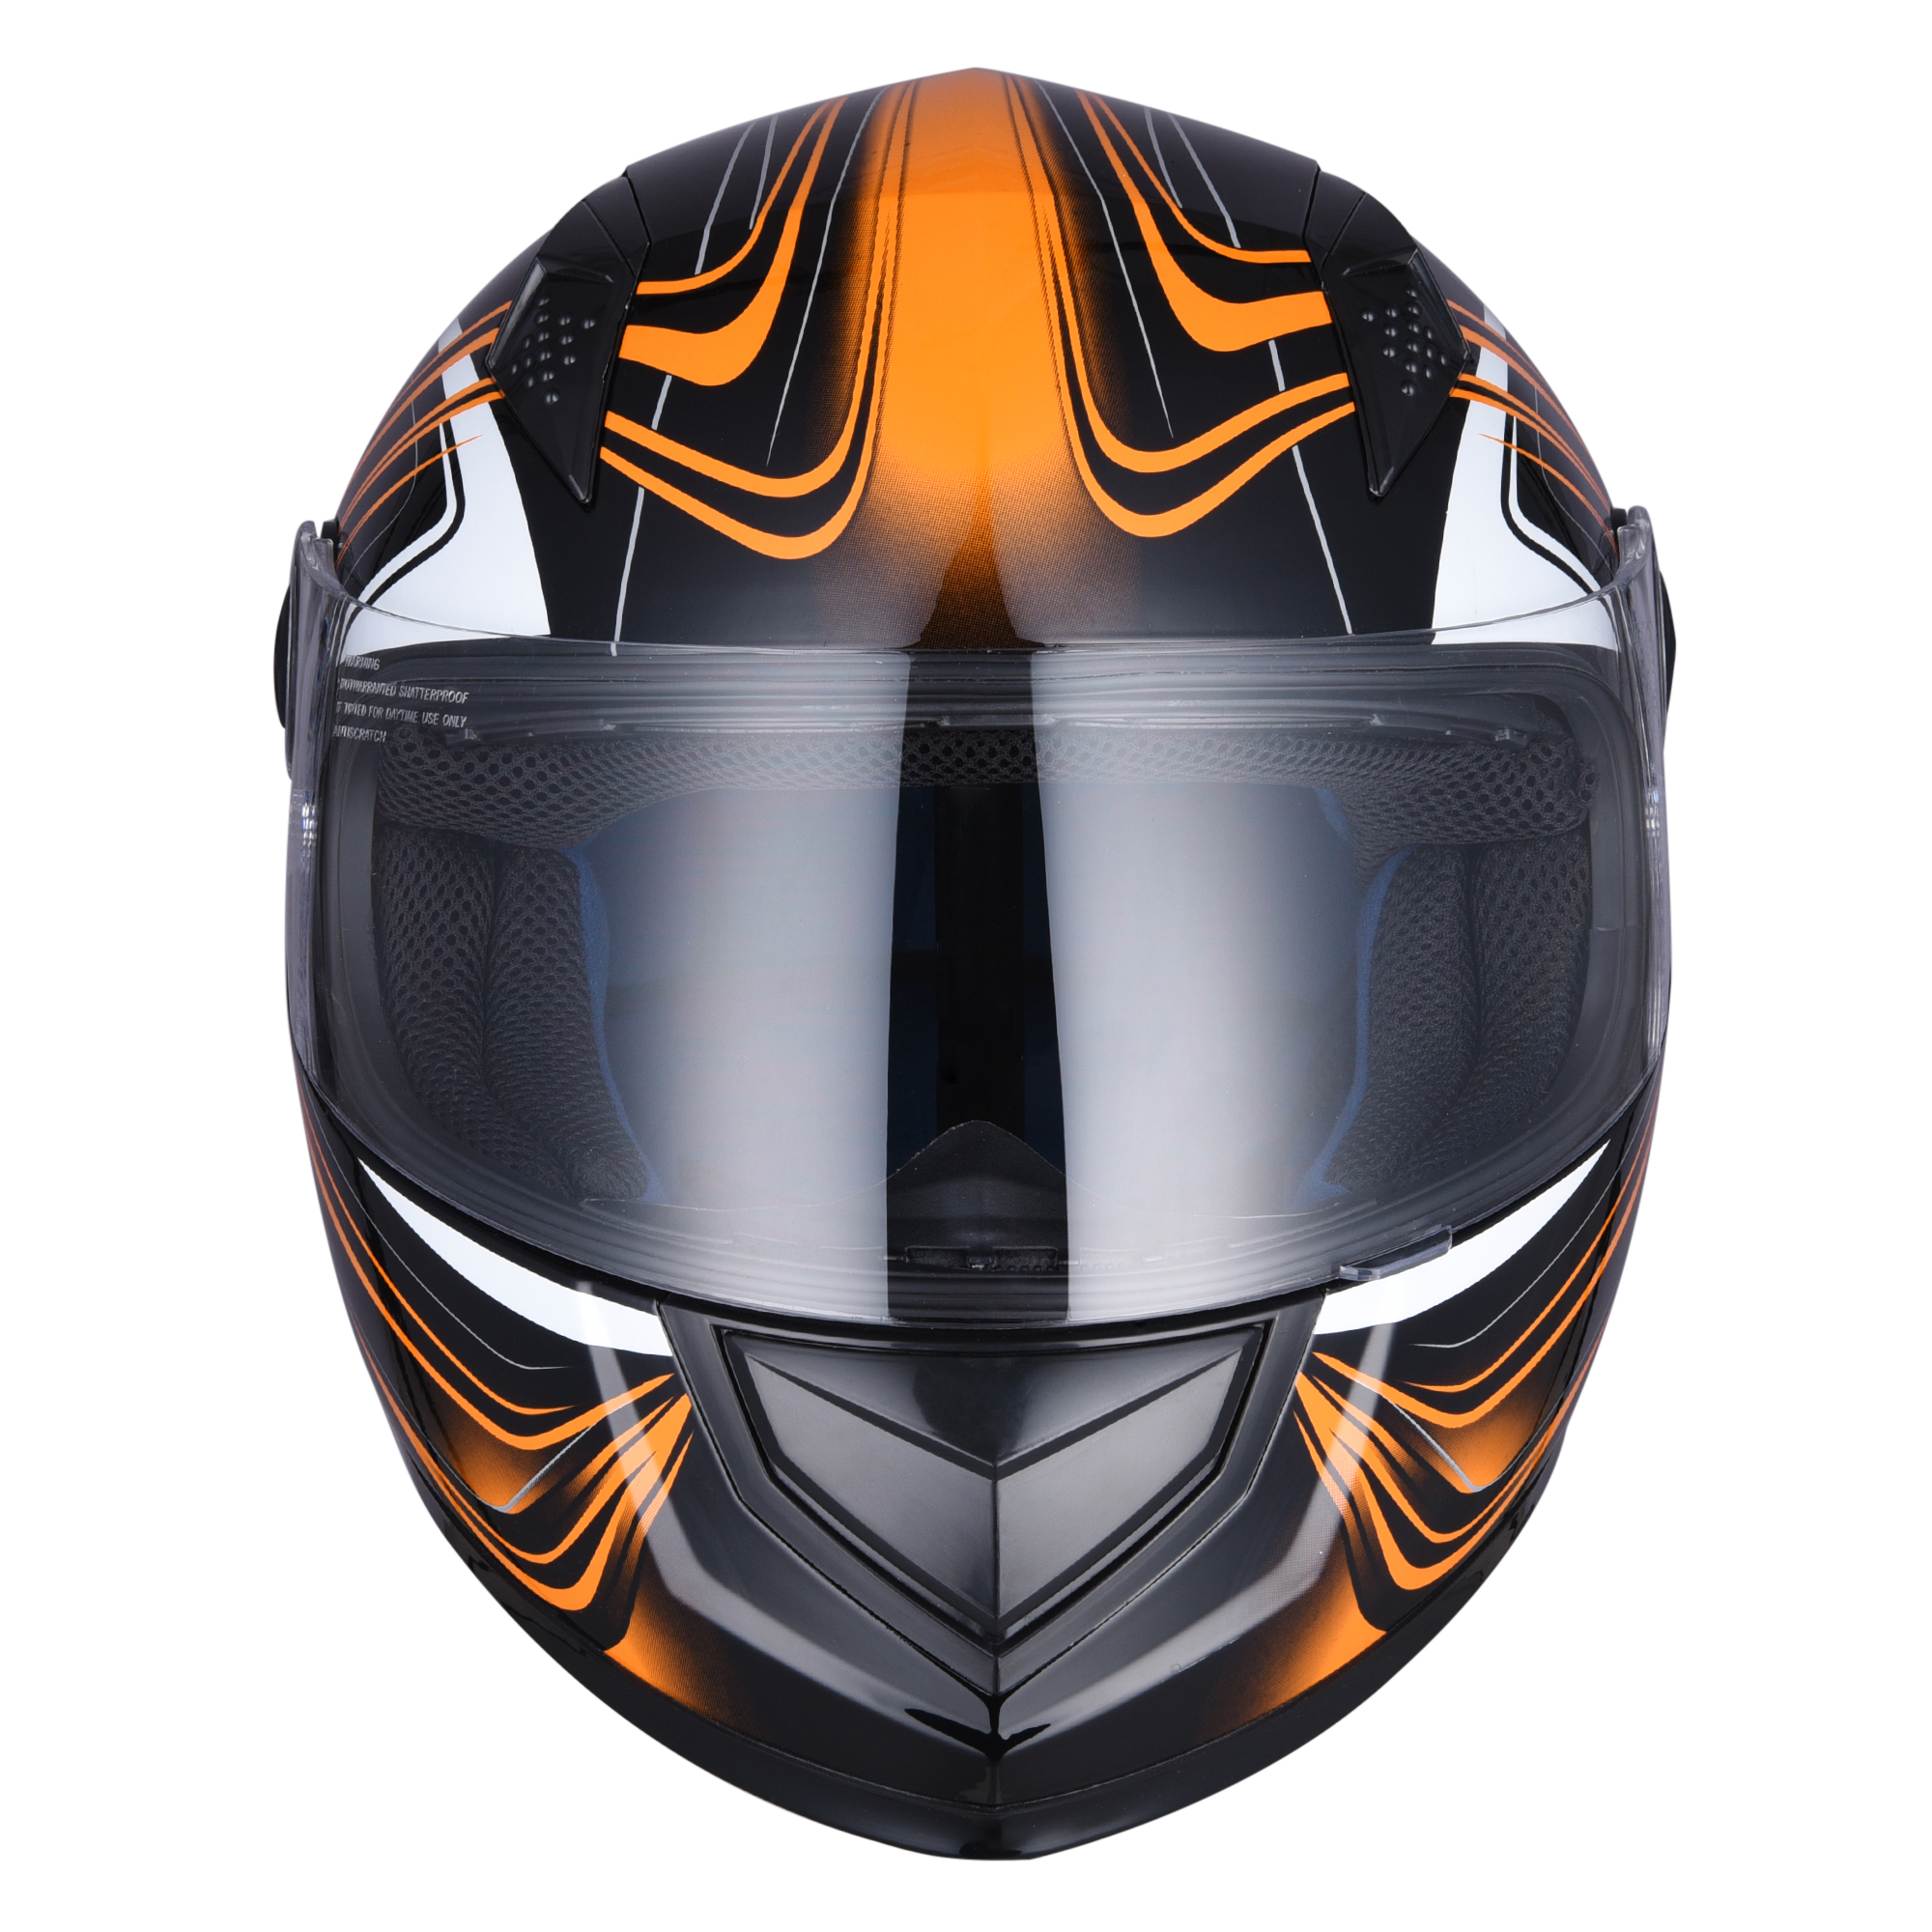 miniature 73 - AHR K12 Full Face Motorcycle Helmet DOT Air Vents Clear Visor Racing S M L XL